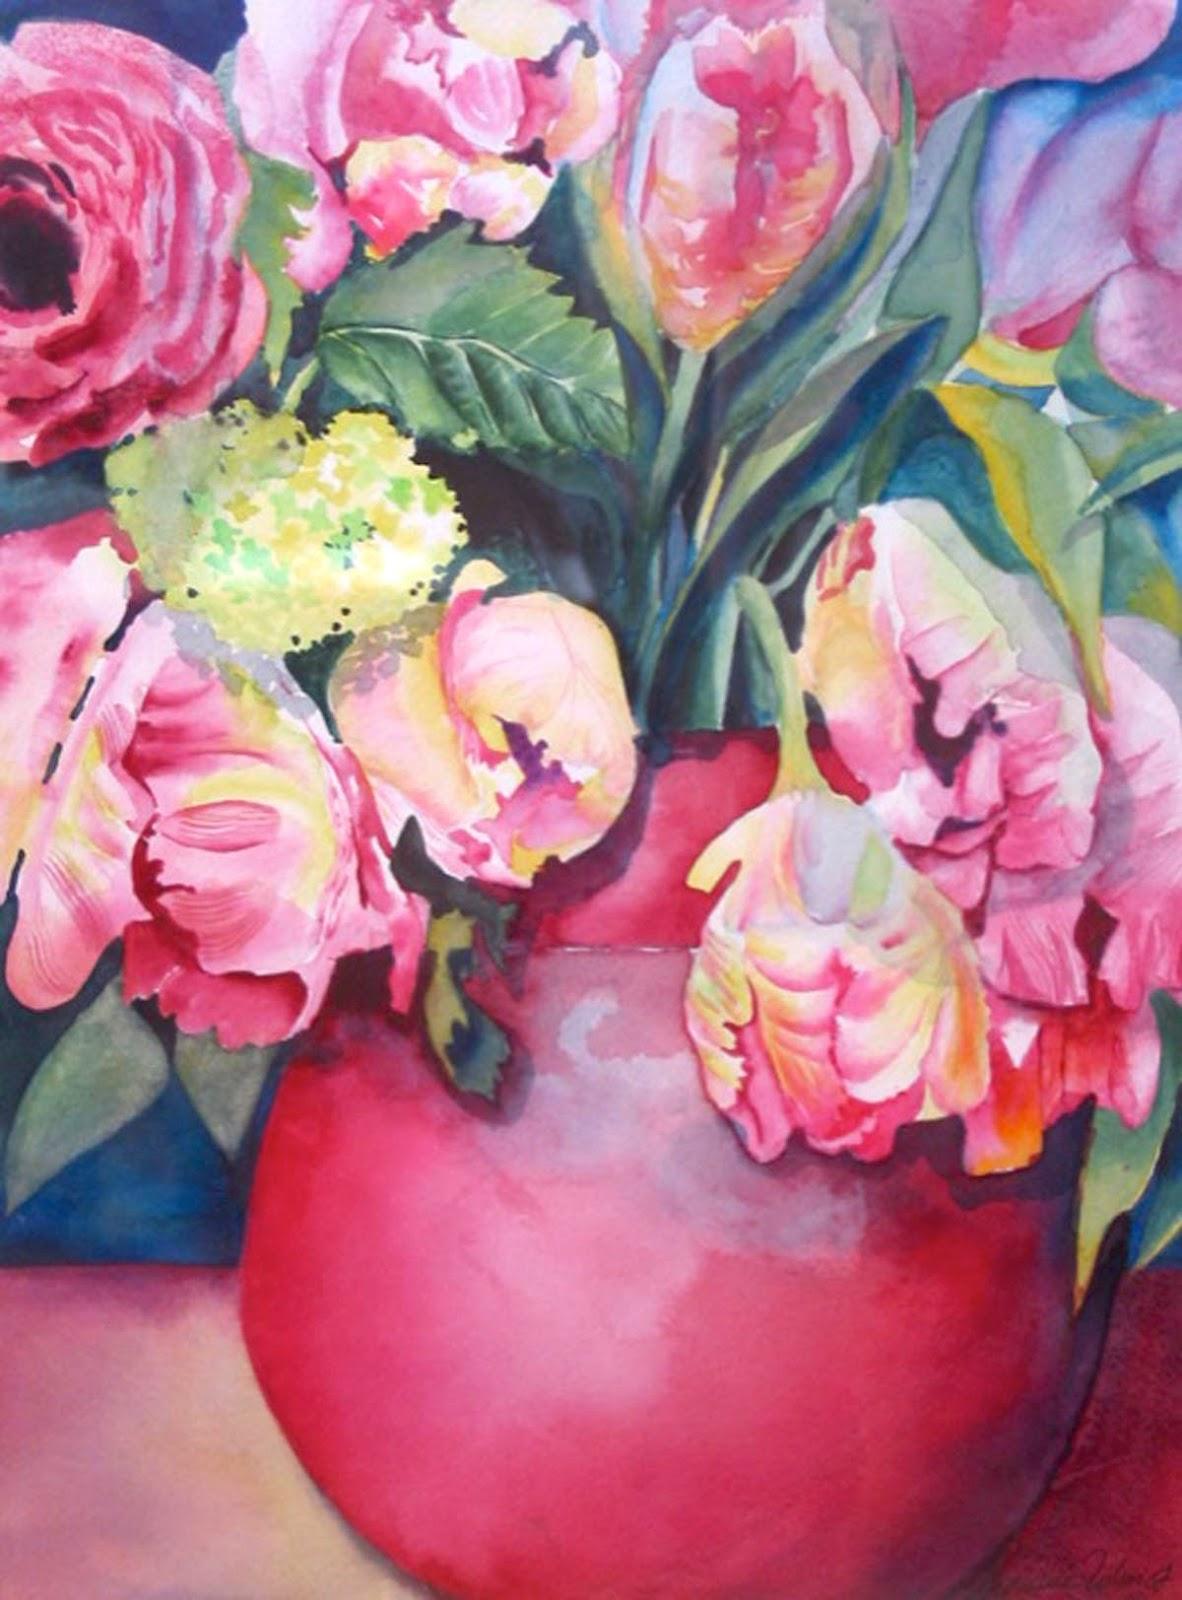 Gartenmalereien: Stiefmütterchen malen